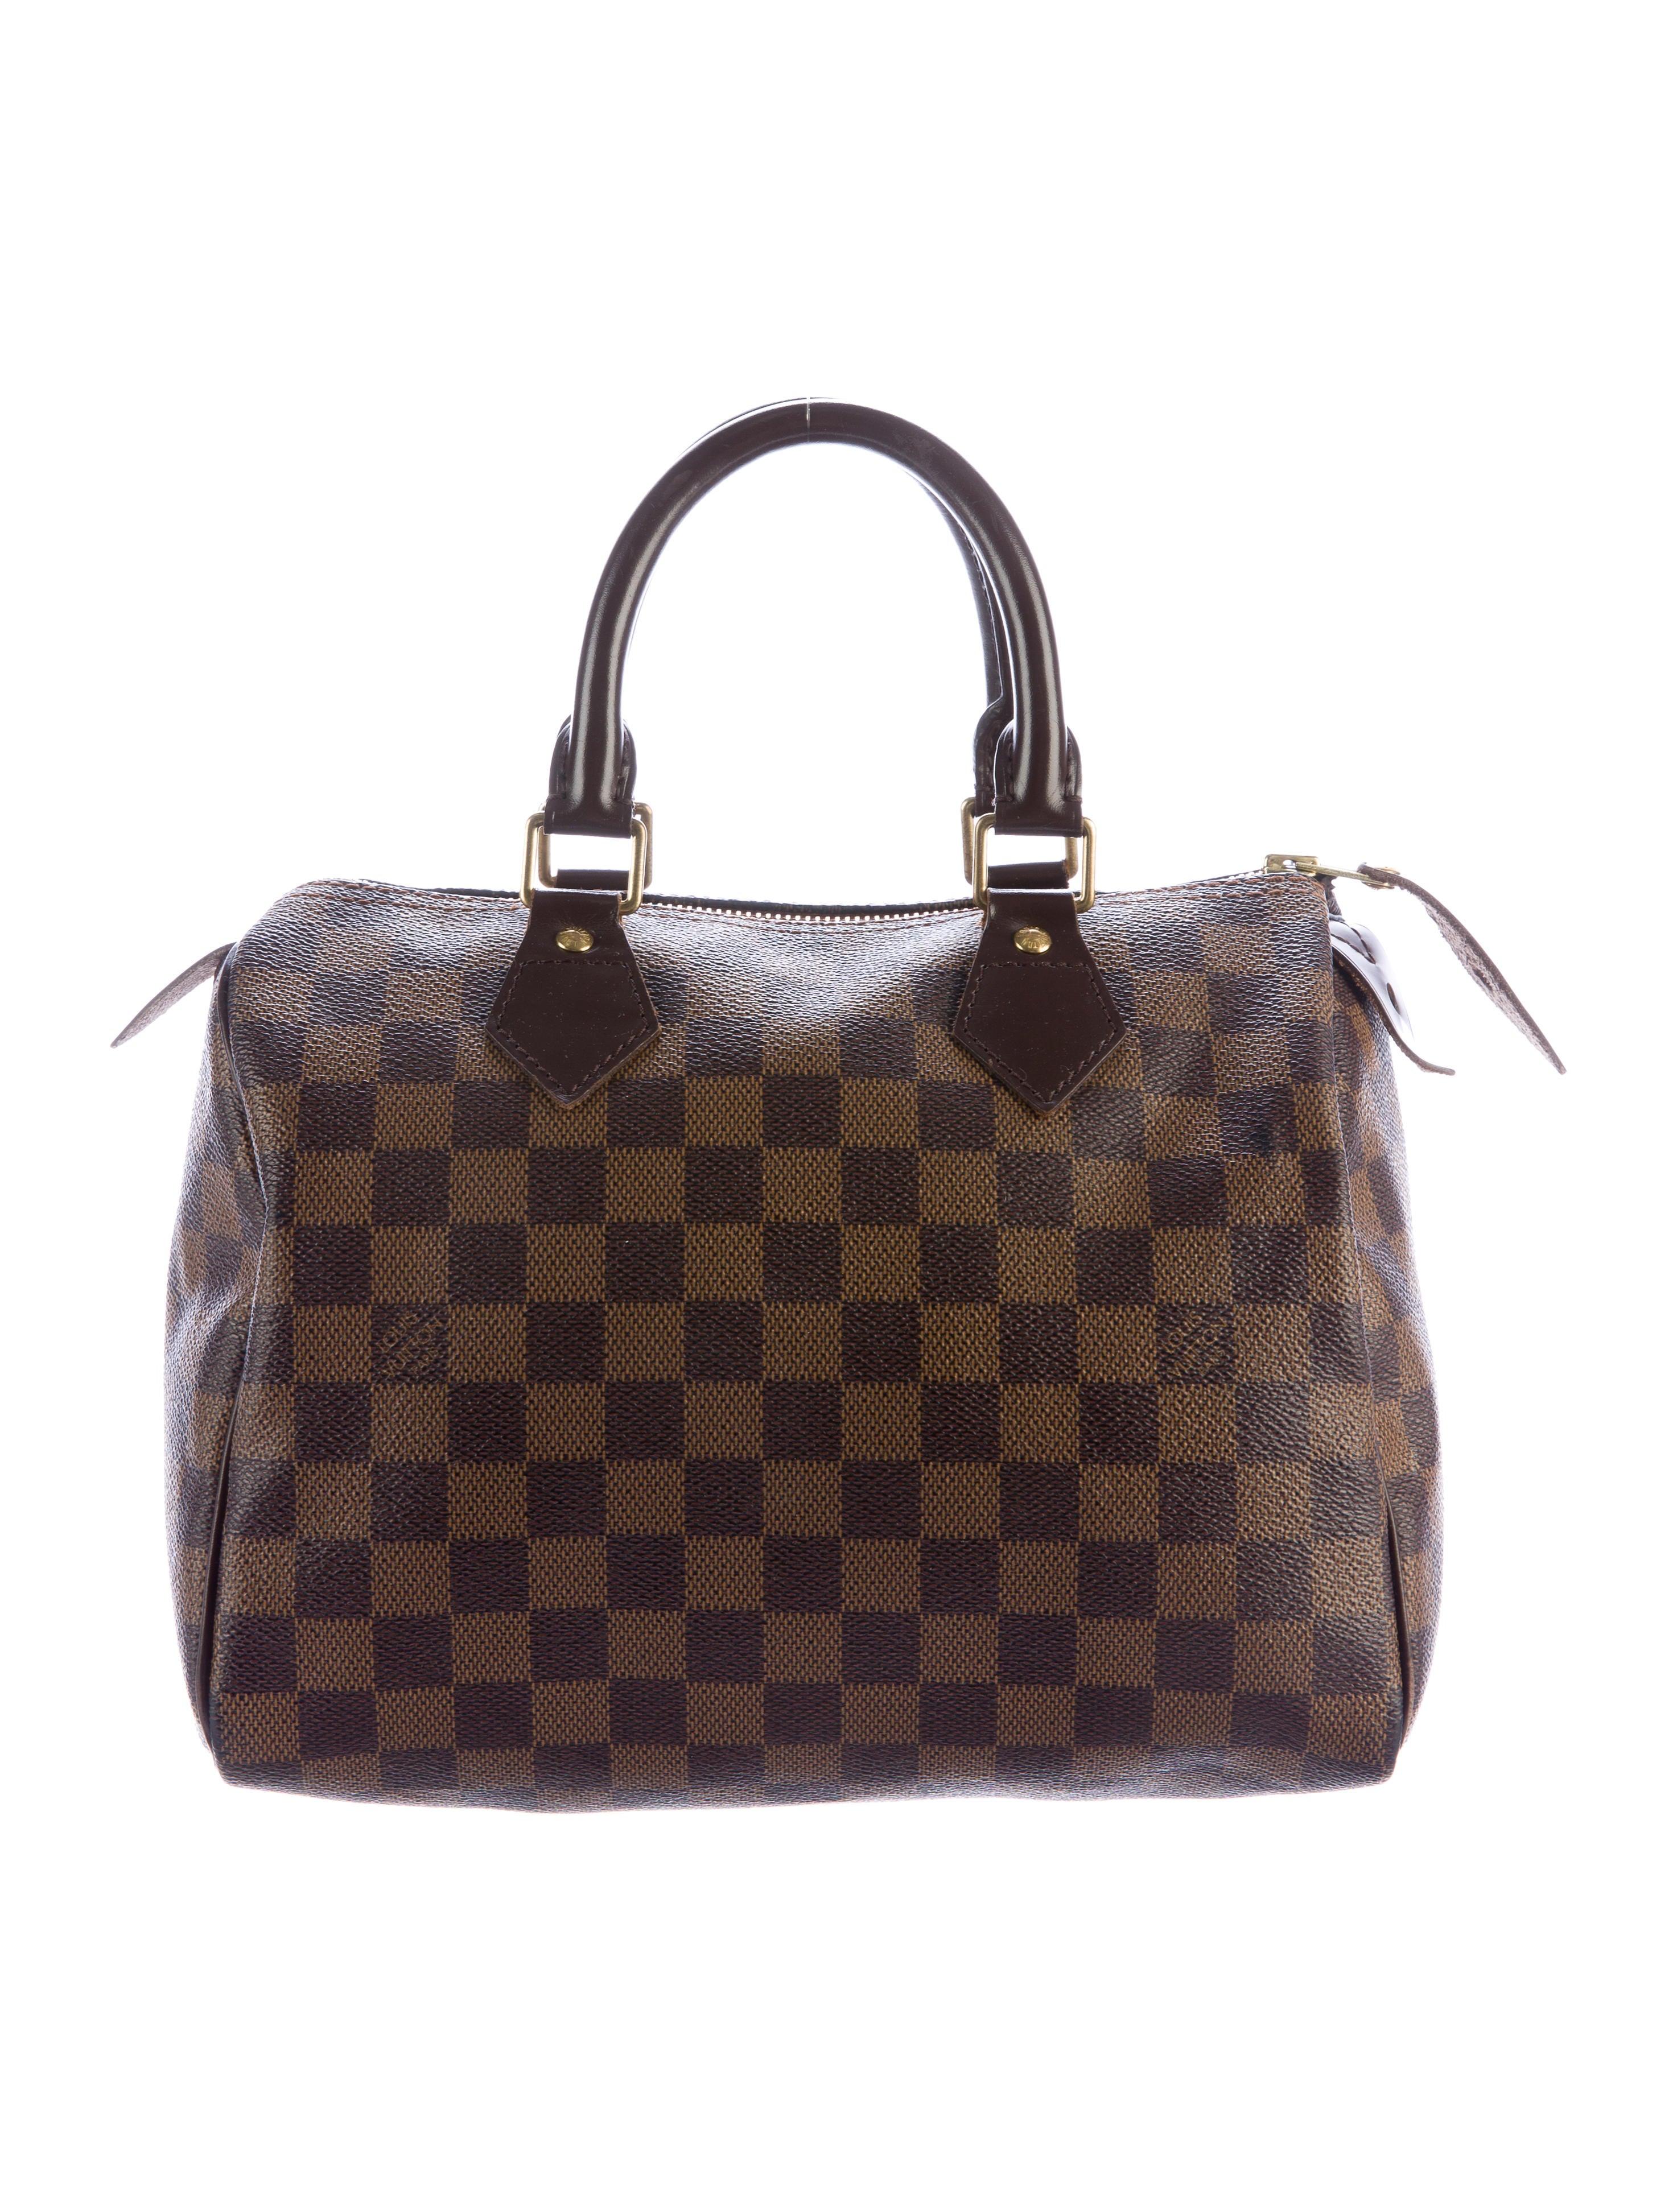 louis vuitton damier ebene speedy 25 handbags. Black Bedroom Furniture Sets. Home Design Ideas